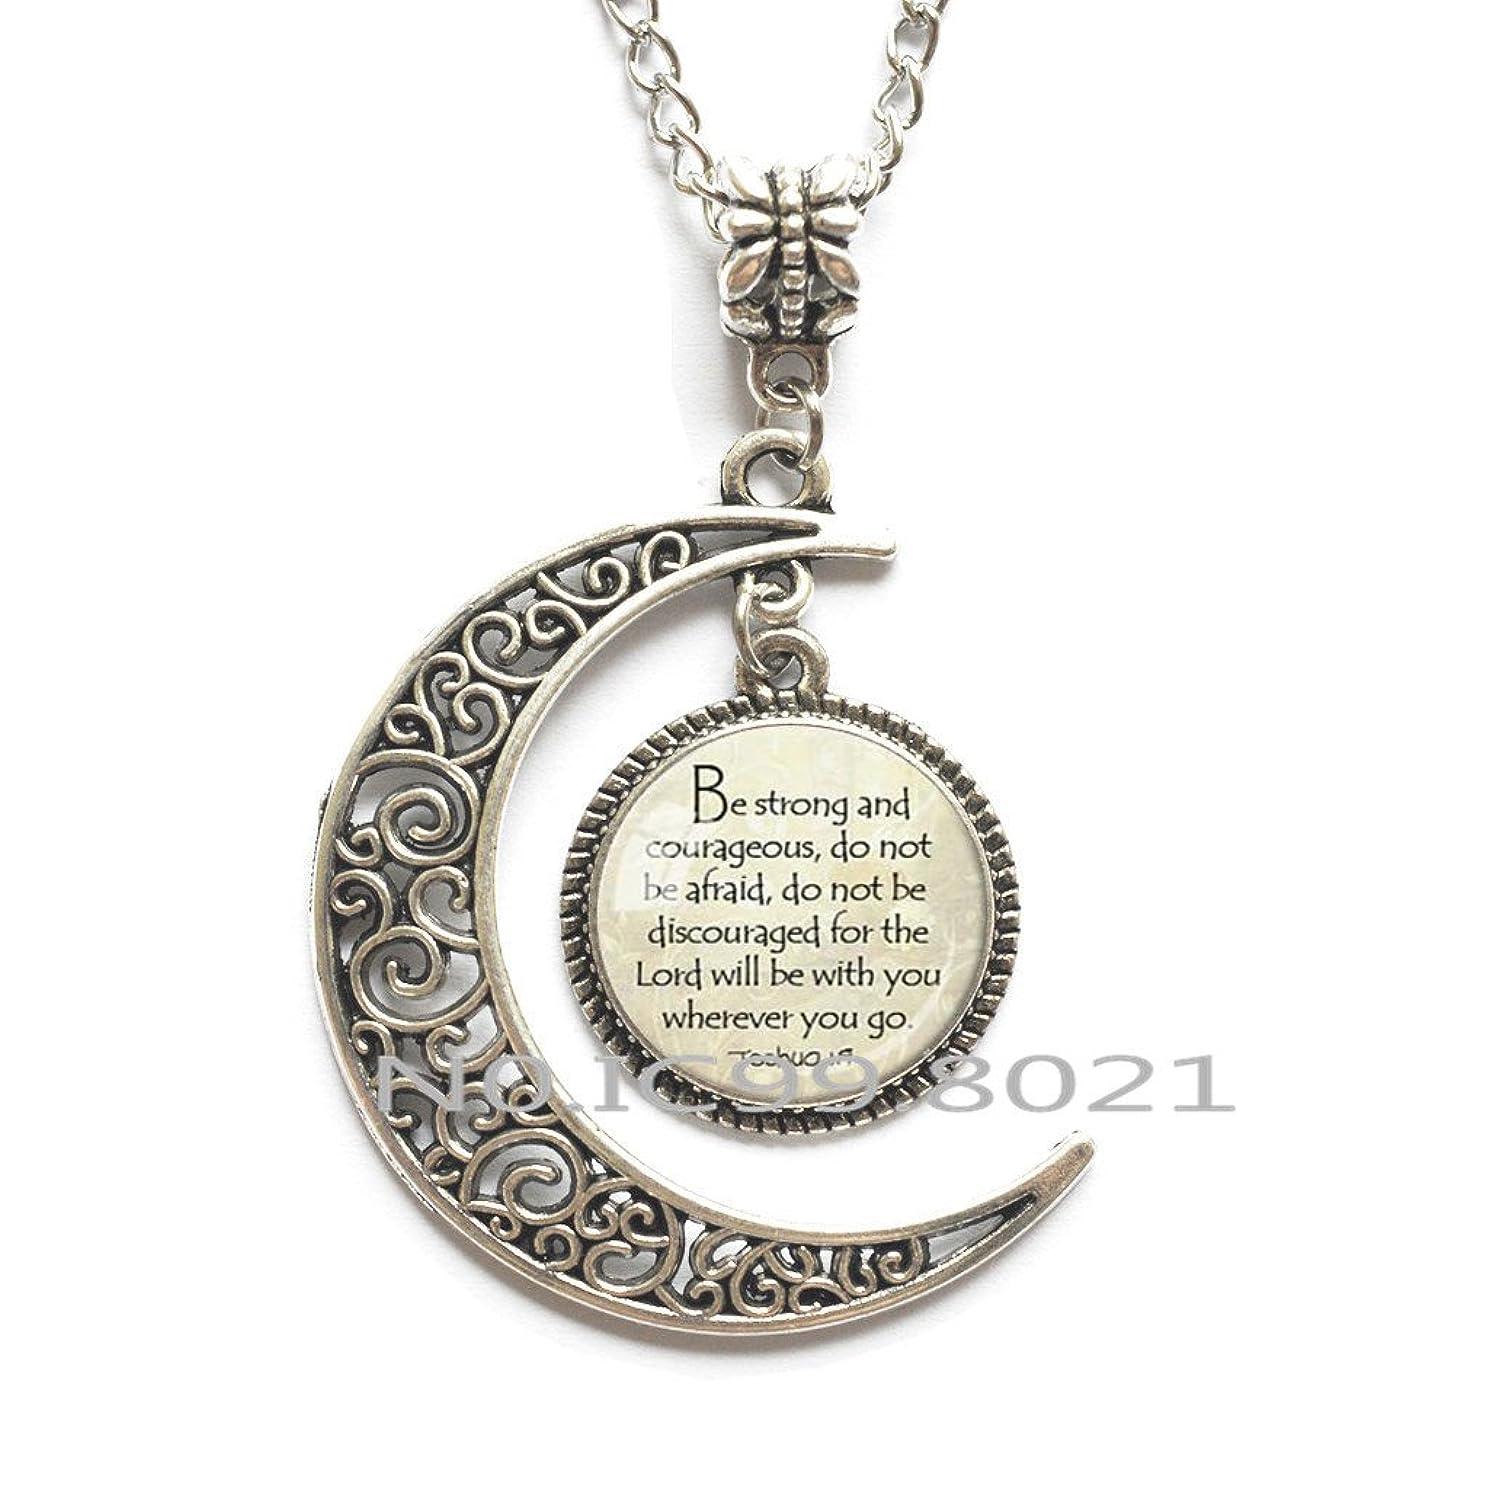 maoqunza JOSHUA 1:9 PENDANT ENCOURAGEMENT Scripture Necklace Christian Pendant Necklace Christian Gift for Christian Jewish Gift Bible Quote Pendant.XT036